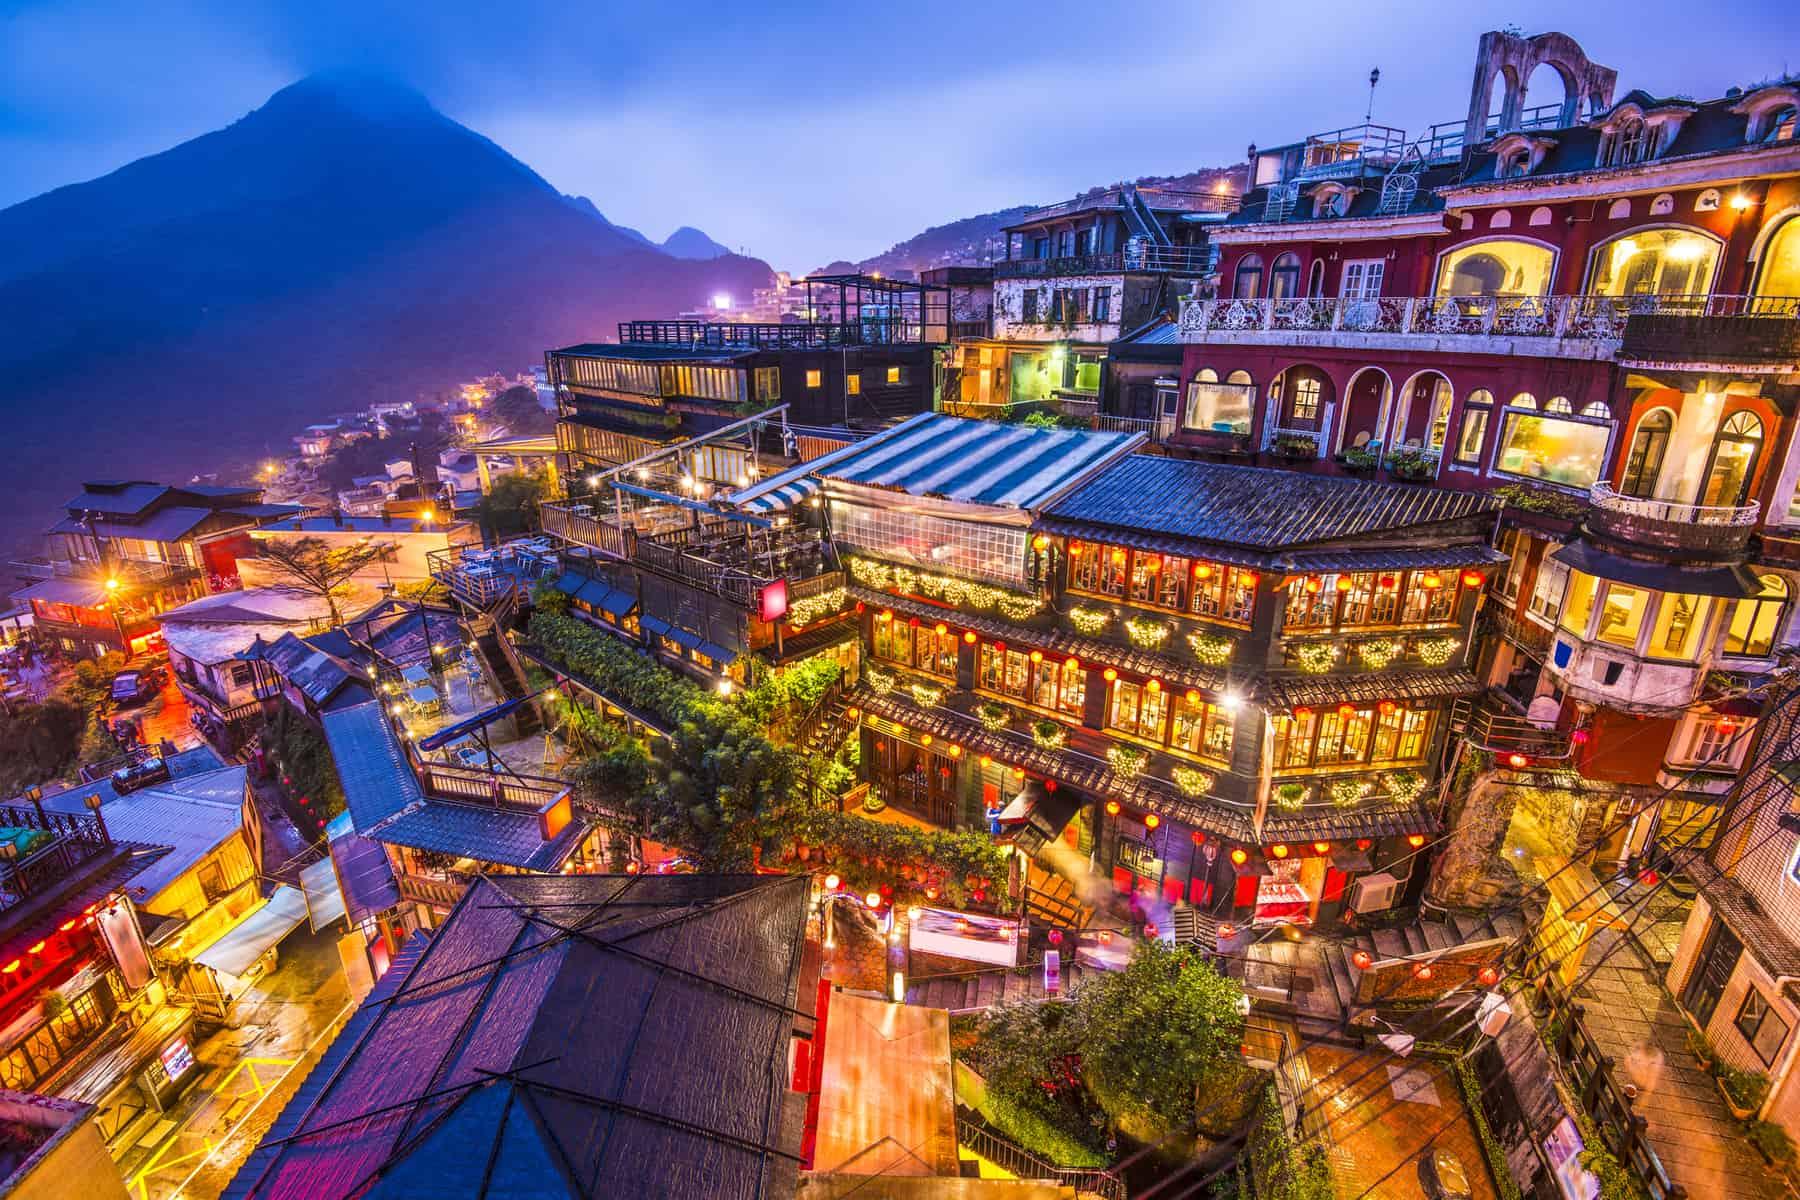 Travel bubbles, Jiufen, Taiwan